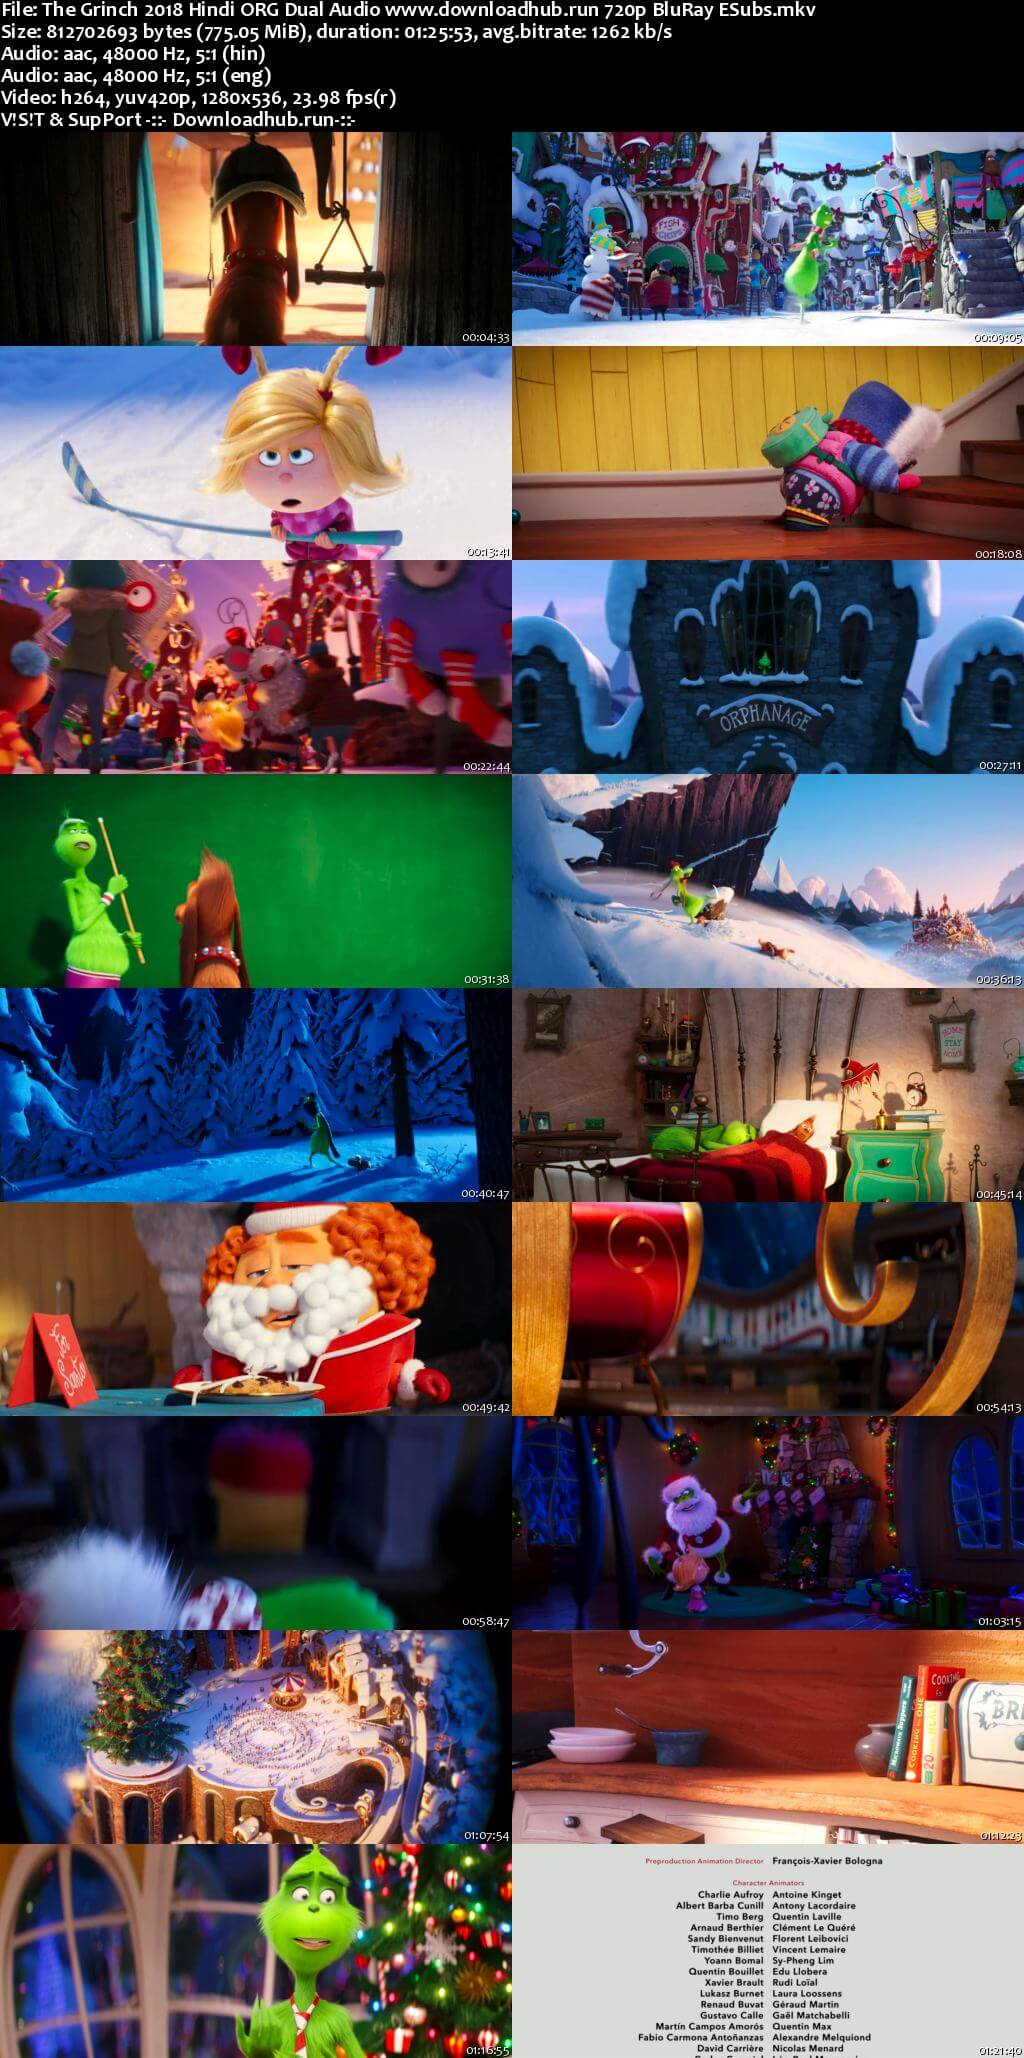 The Grinch 2018 Hindi ORG Dual Audio 720p BluRay ESubs